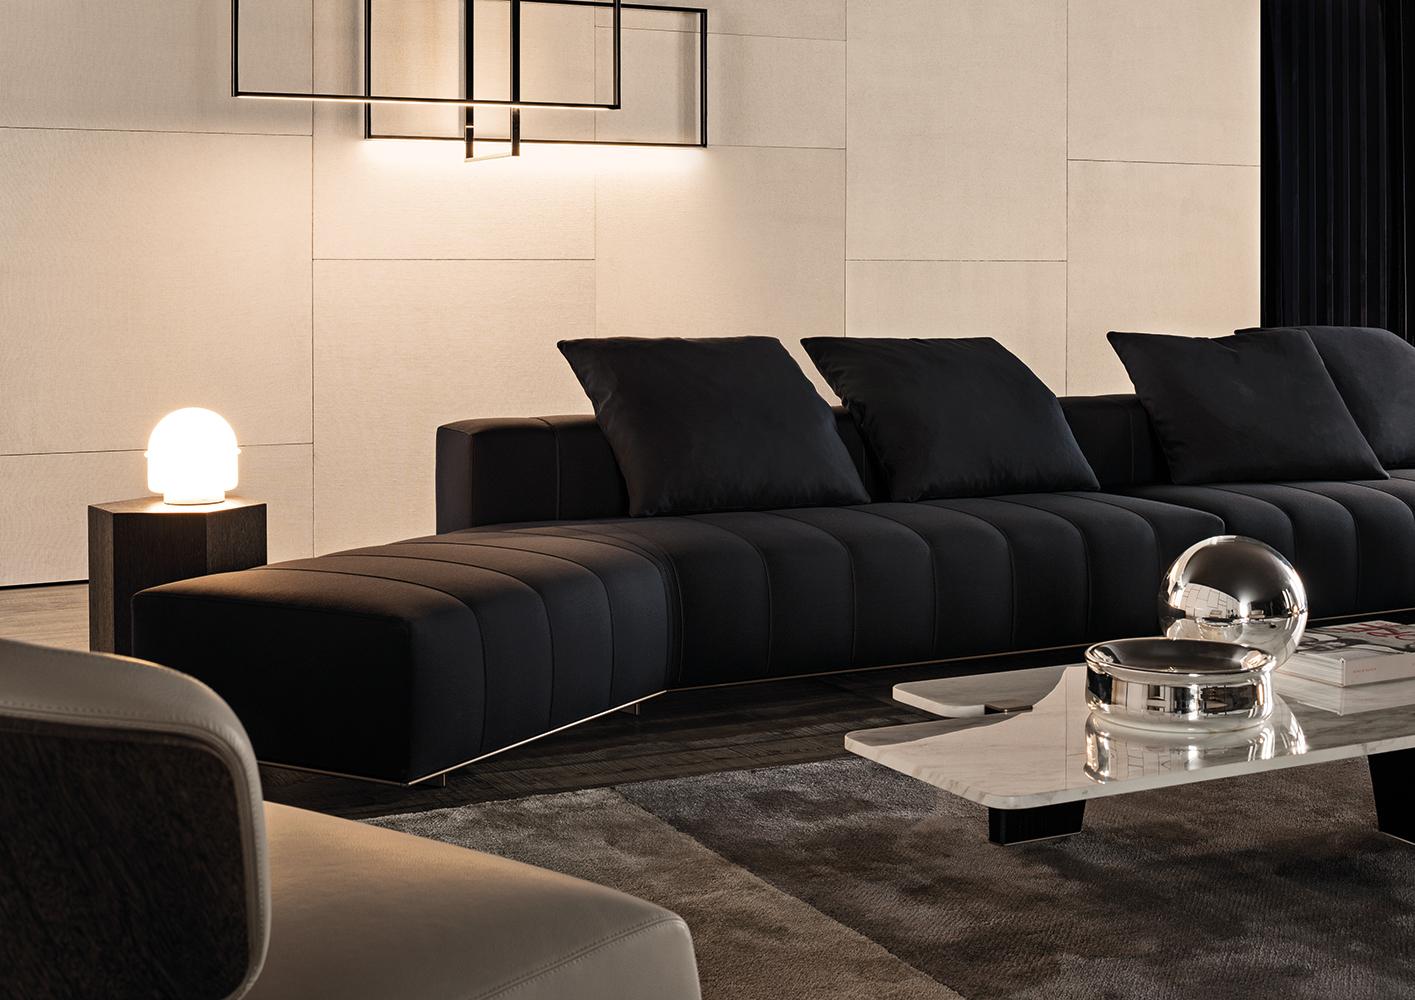 Freeman Lounge Designed by Rodolfo Dordini Minotti